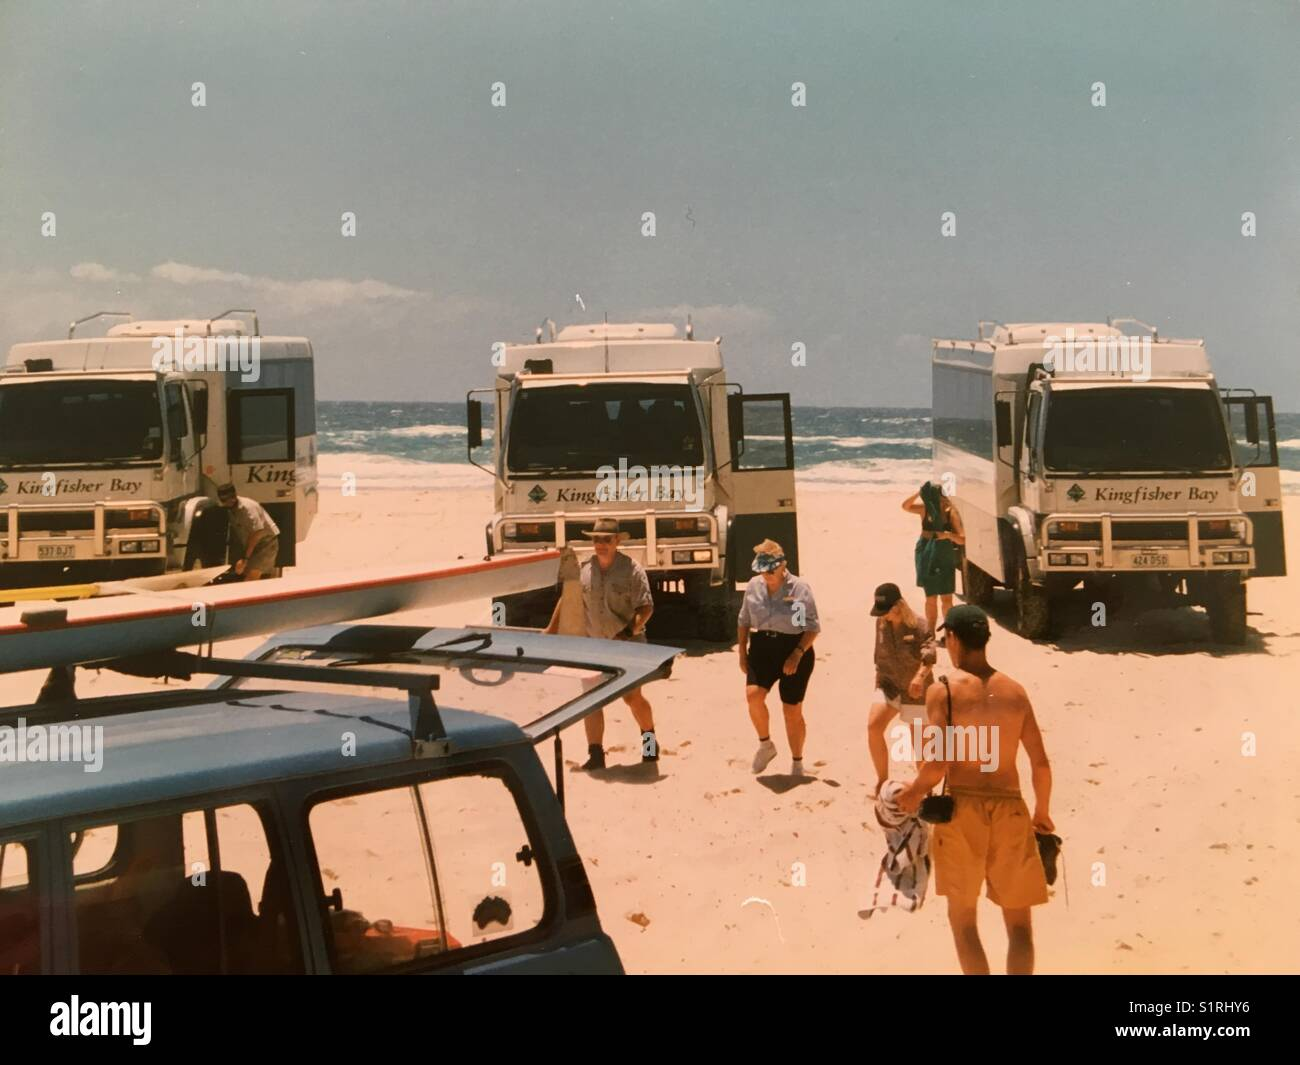 Kingfisher Bay, an Australian beach of distinction. - Stock Image